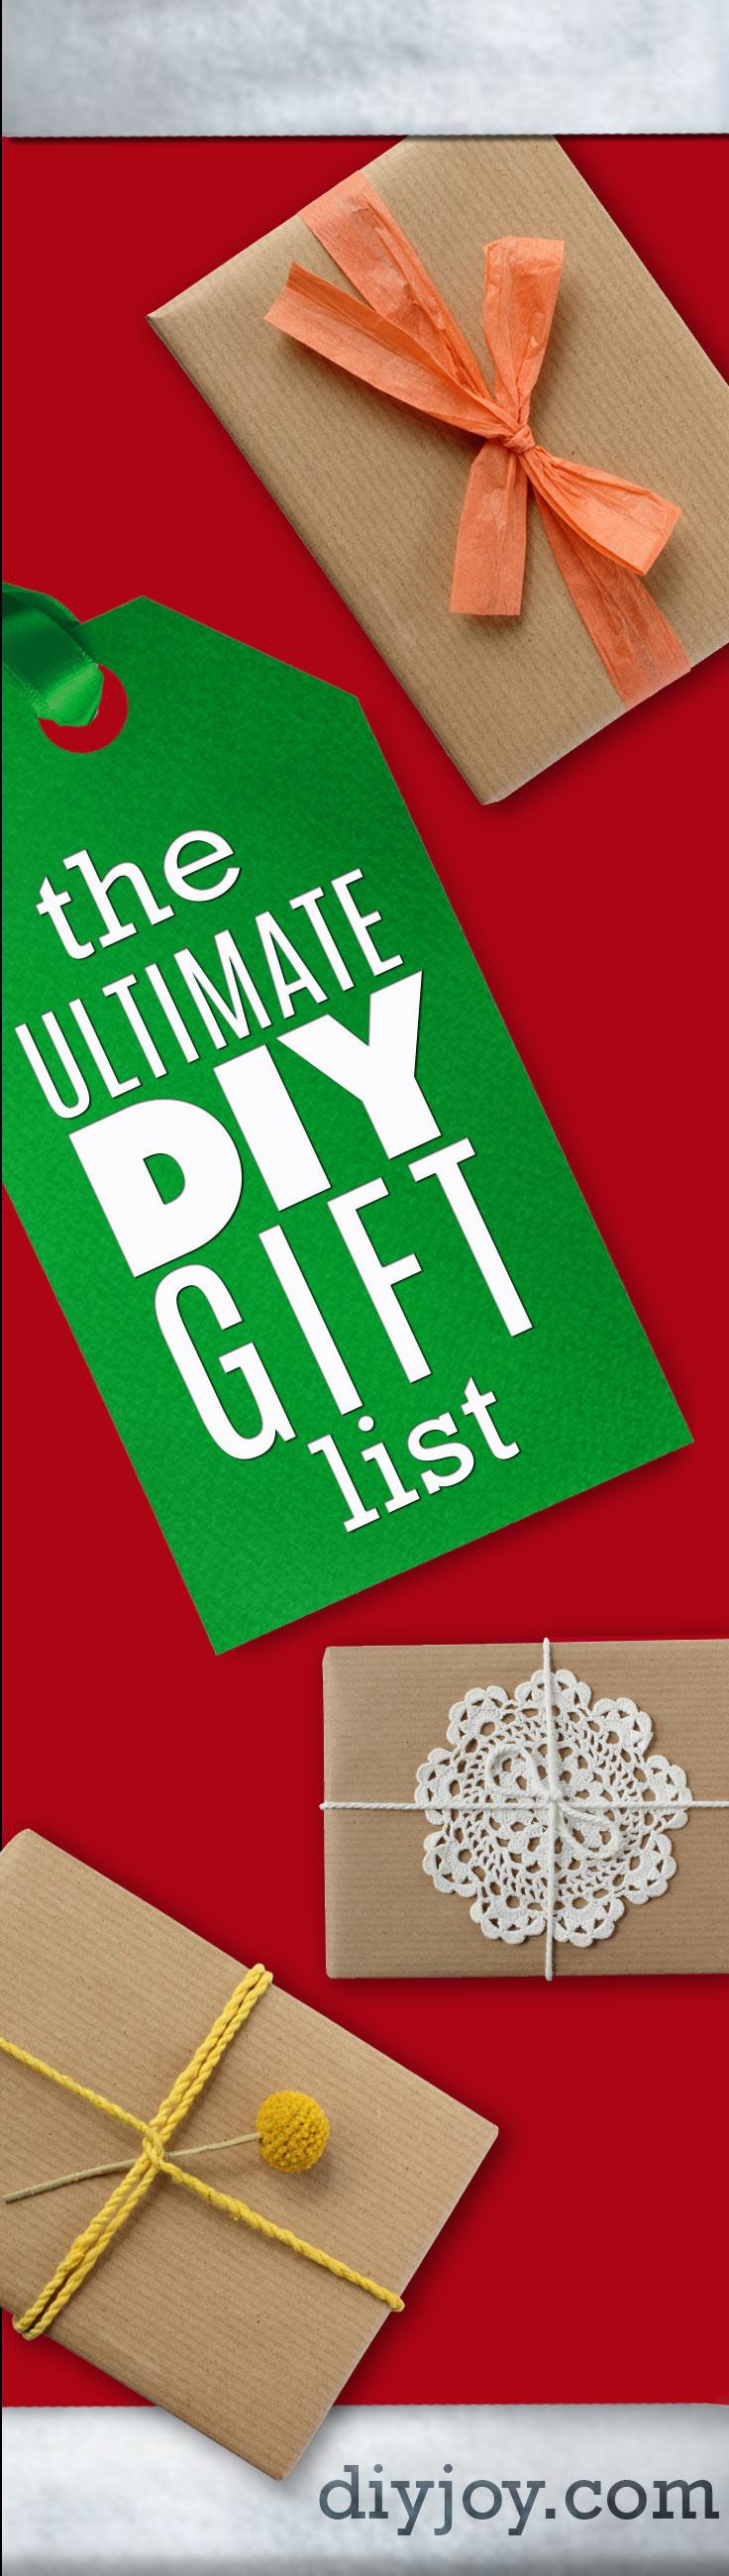 DIY Boyfriend Christmas Gifts  The Ultimate DIY Christmas Gifts list